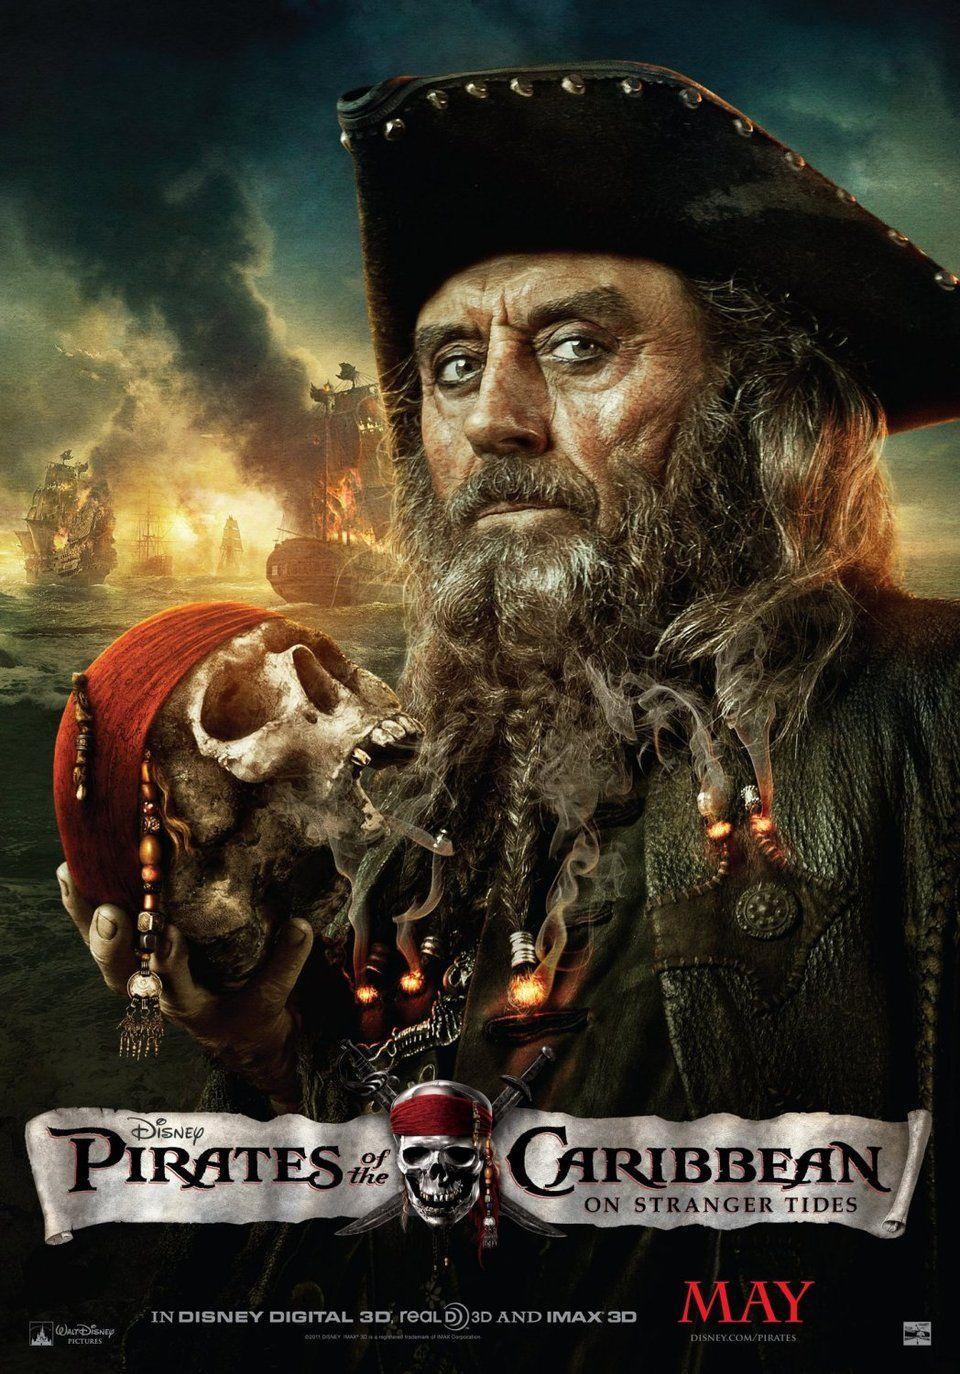 Thearthunters Piratas Del Caribe 2 Piratas Del Caribe Imágenes De Piratas